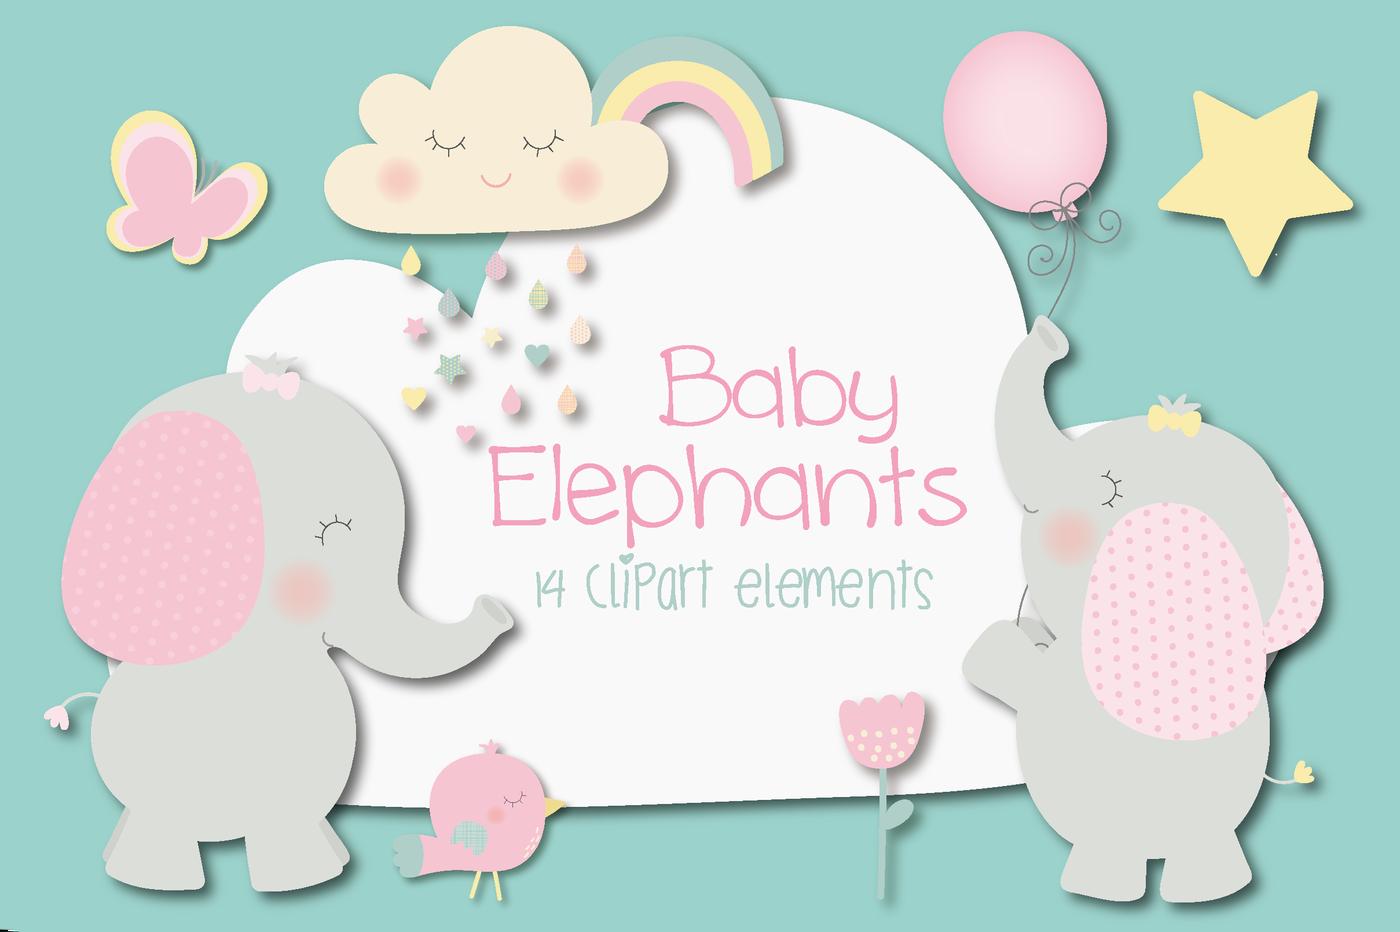 Baby elephant clipart By Poppymoon Design | TheHungryJPEG.com